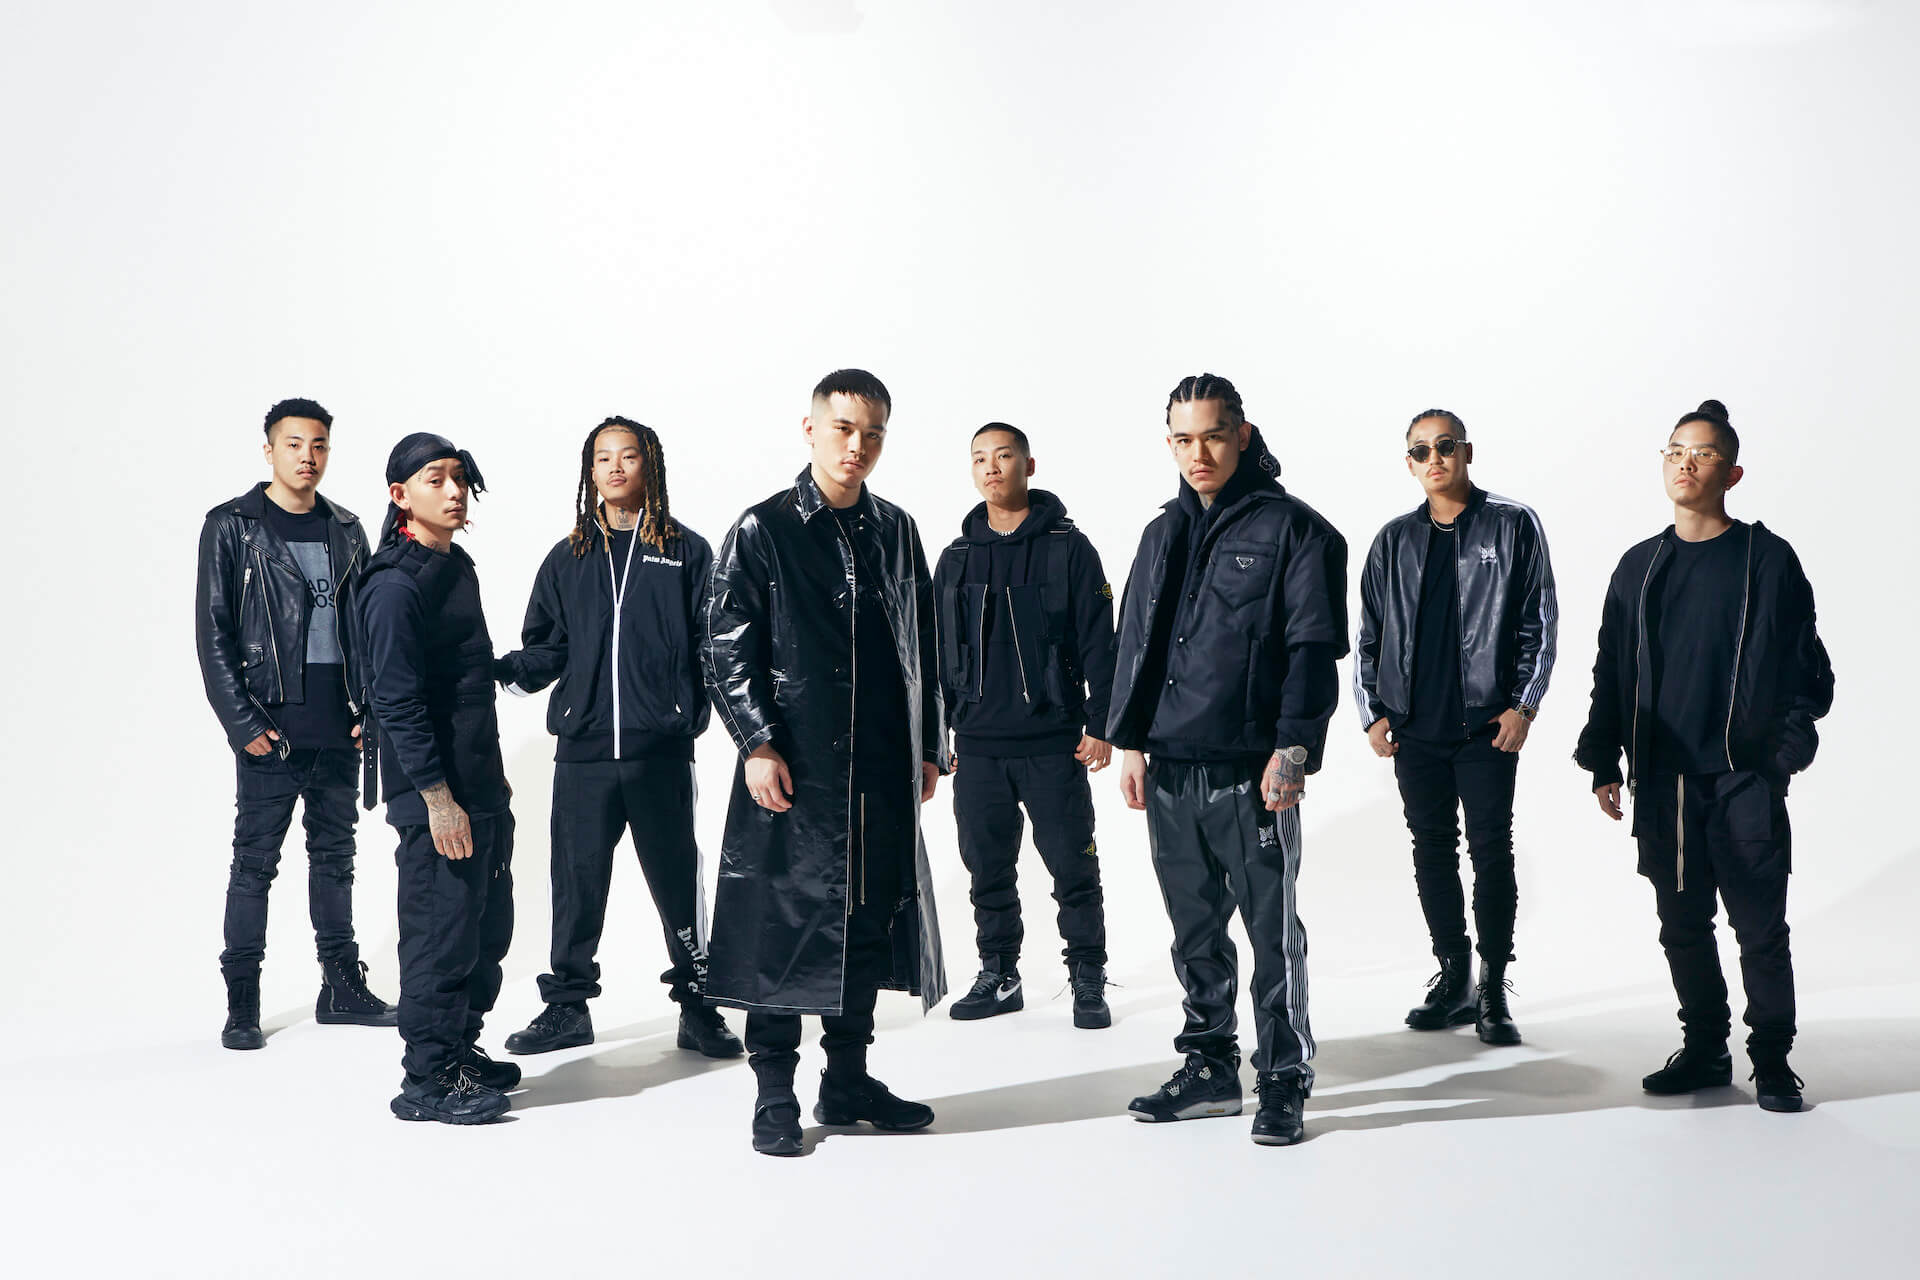 BAD HOPの横浜アリーナ再リベンジ公演が開催決定!チケットが明日発売 music210614_badhop_1